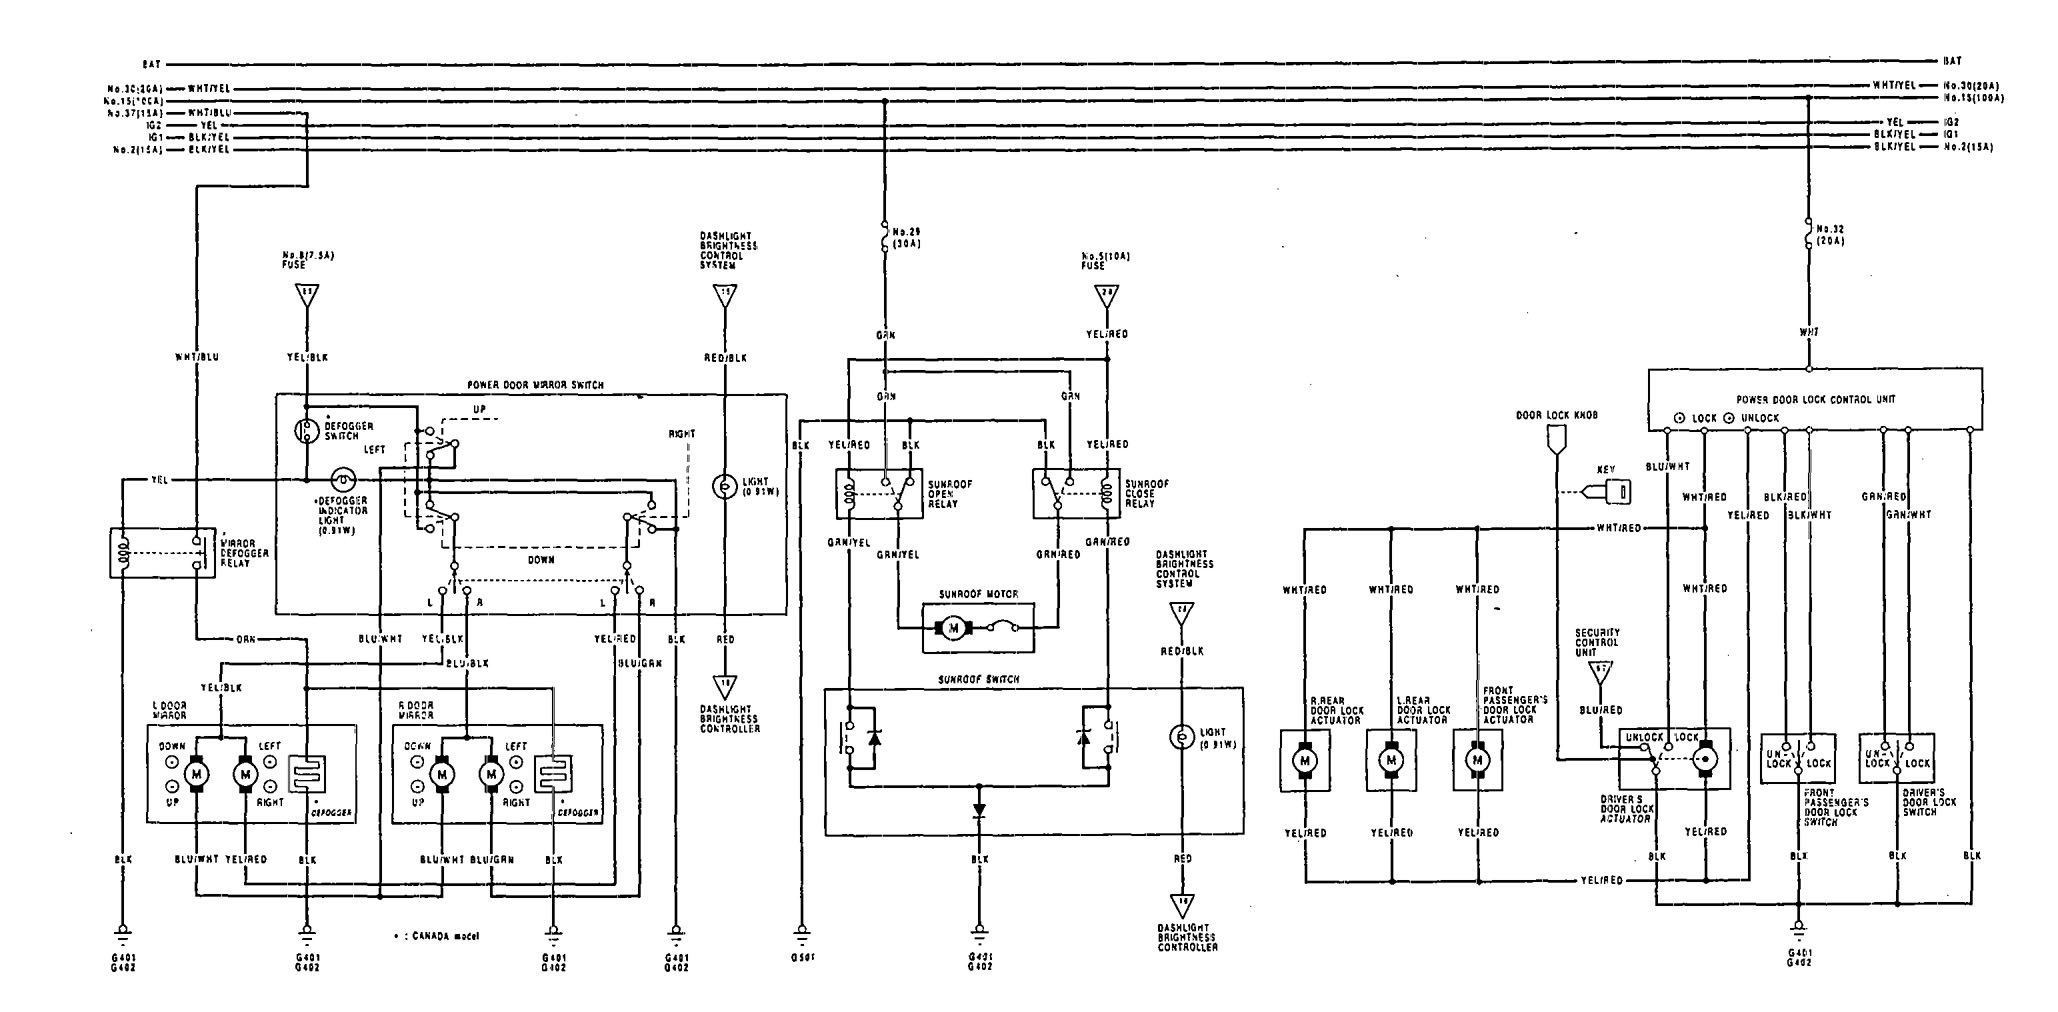 Acura Vigor (1992 - 1993) - wiring diagrams - power mirrors -  Carknowledge.info | Acura Vigor Wiring Diagram |  | Carknowledge.info